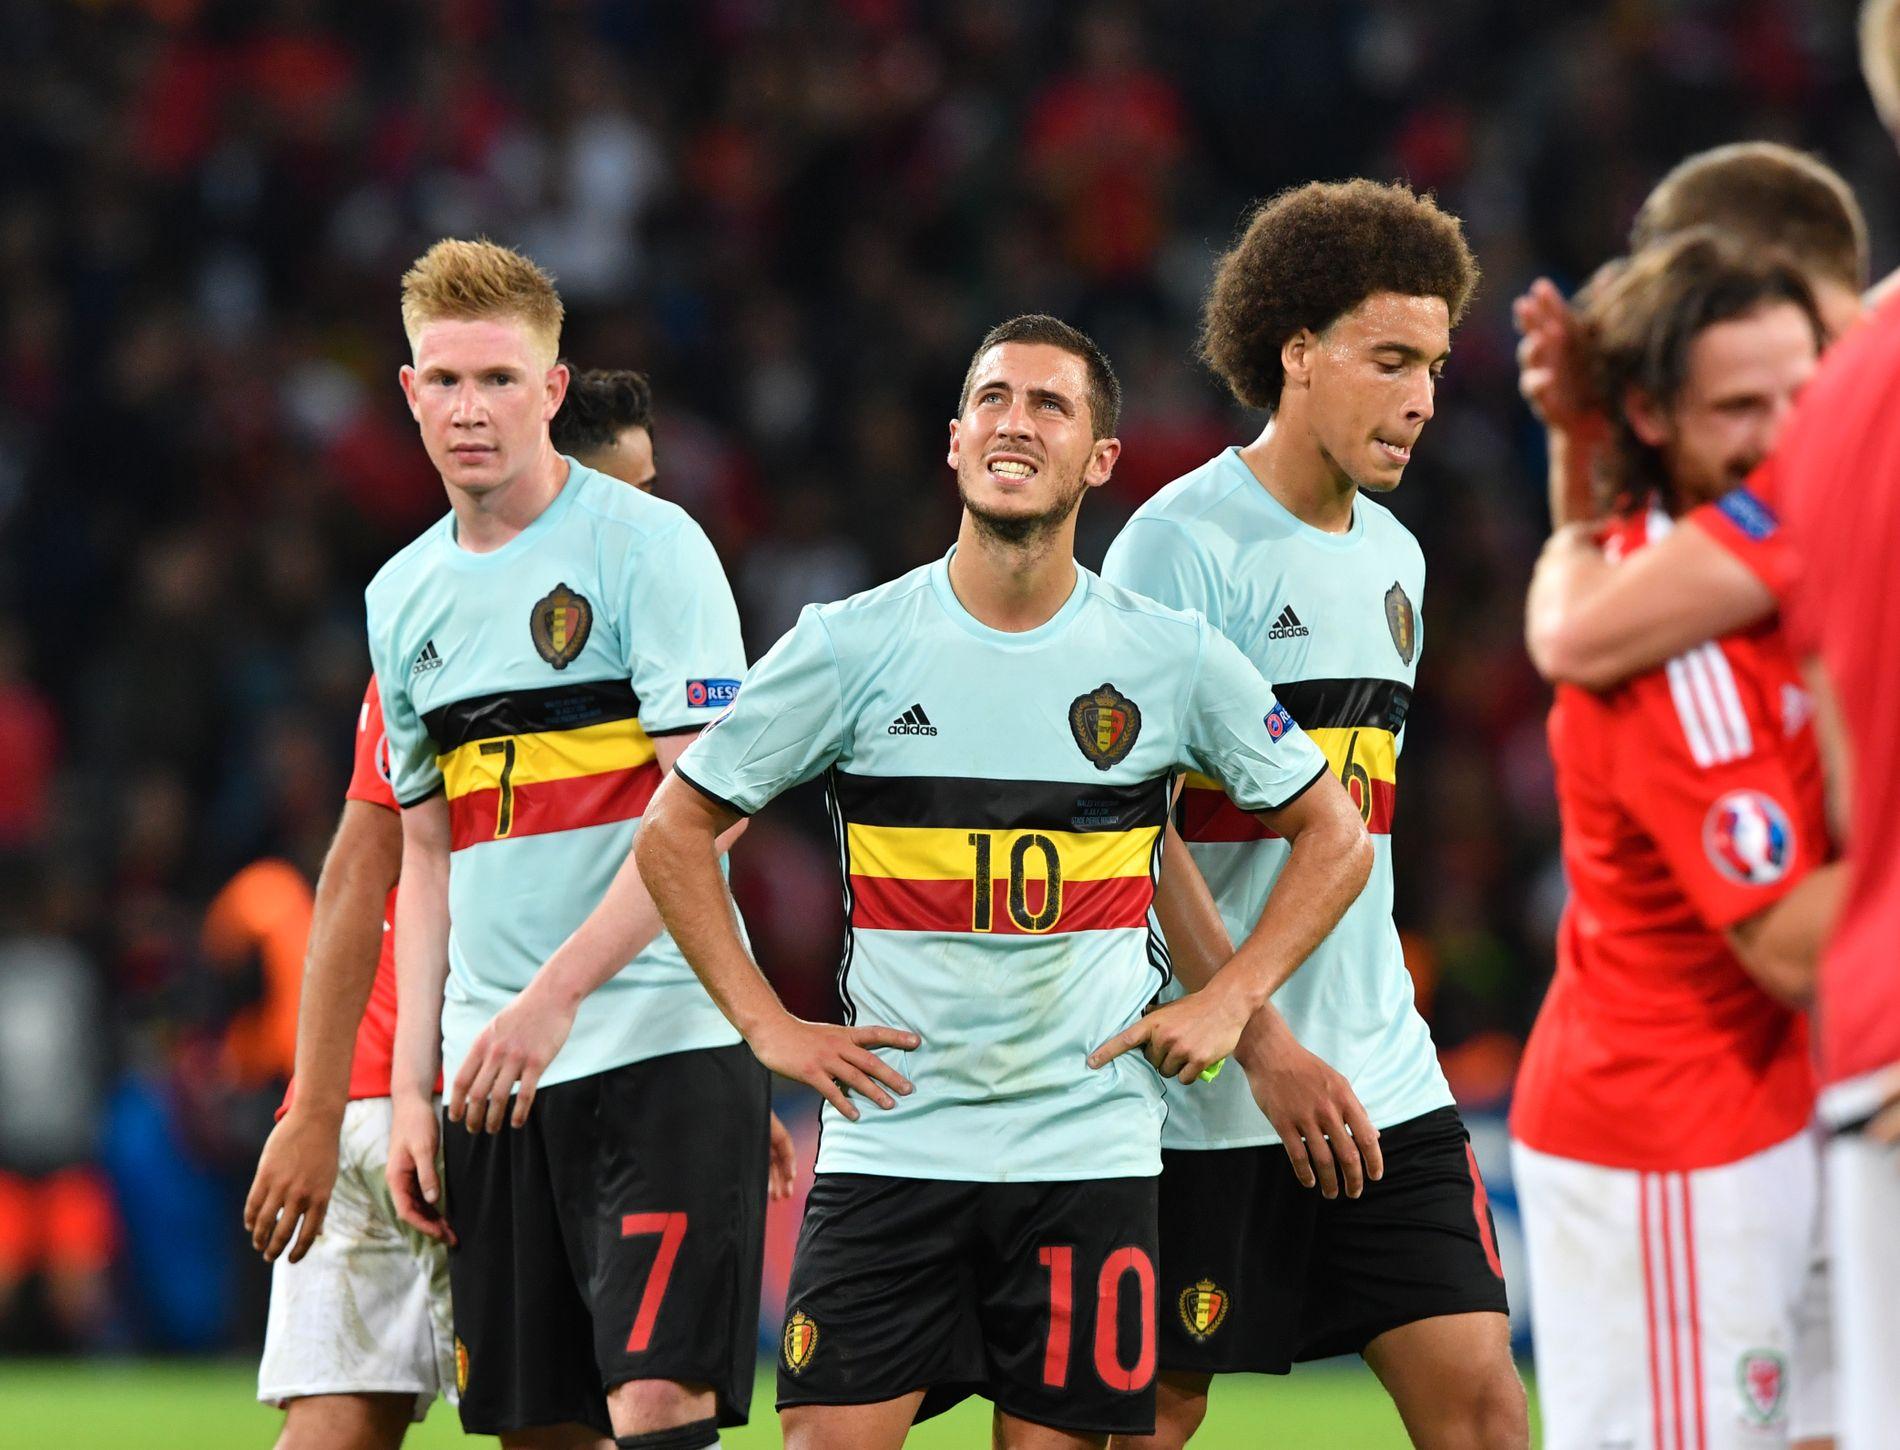 SKUFFELSEN: Kevin De Bruyne, Eden Hazard og Axel Witsel viser sin skuffelse etter EM-exiten mot Wales.